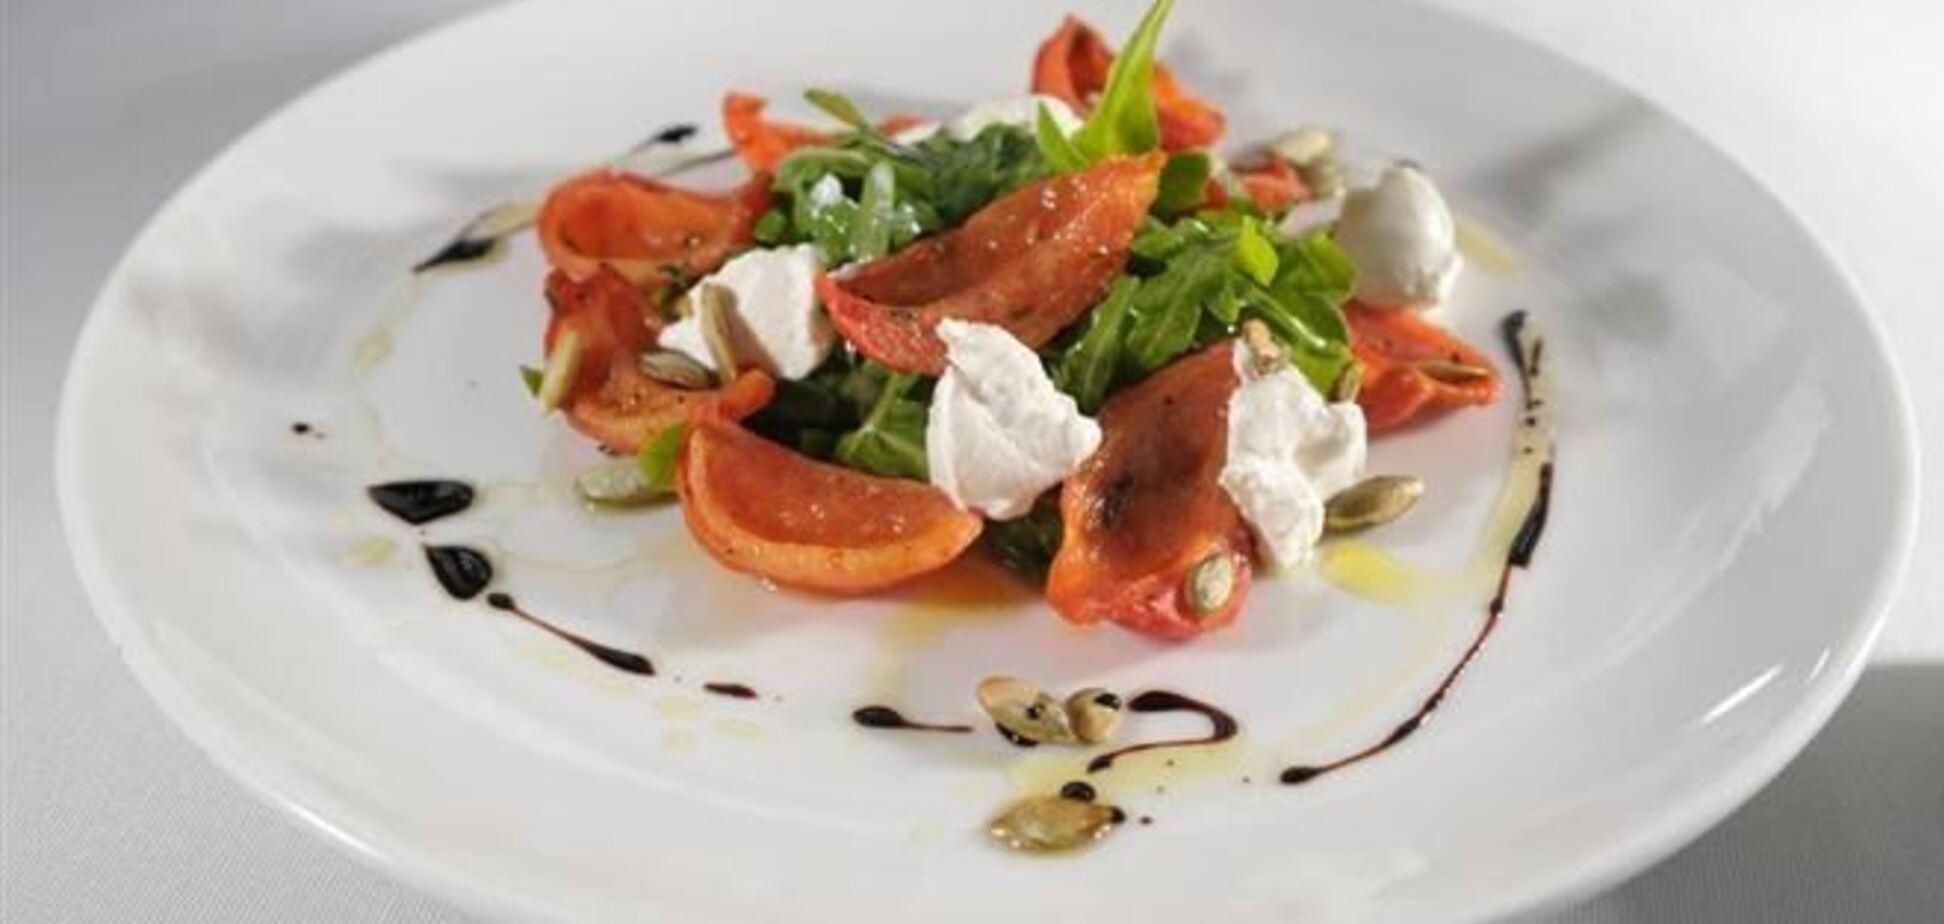 Ресторан Piccolino презентовал зимнее меню